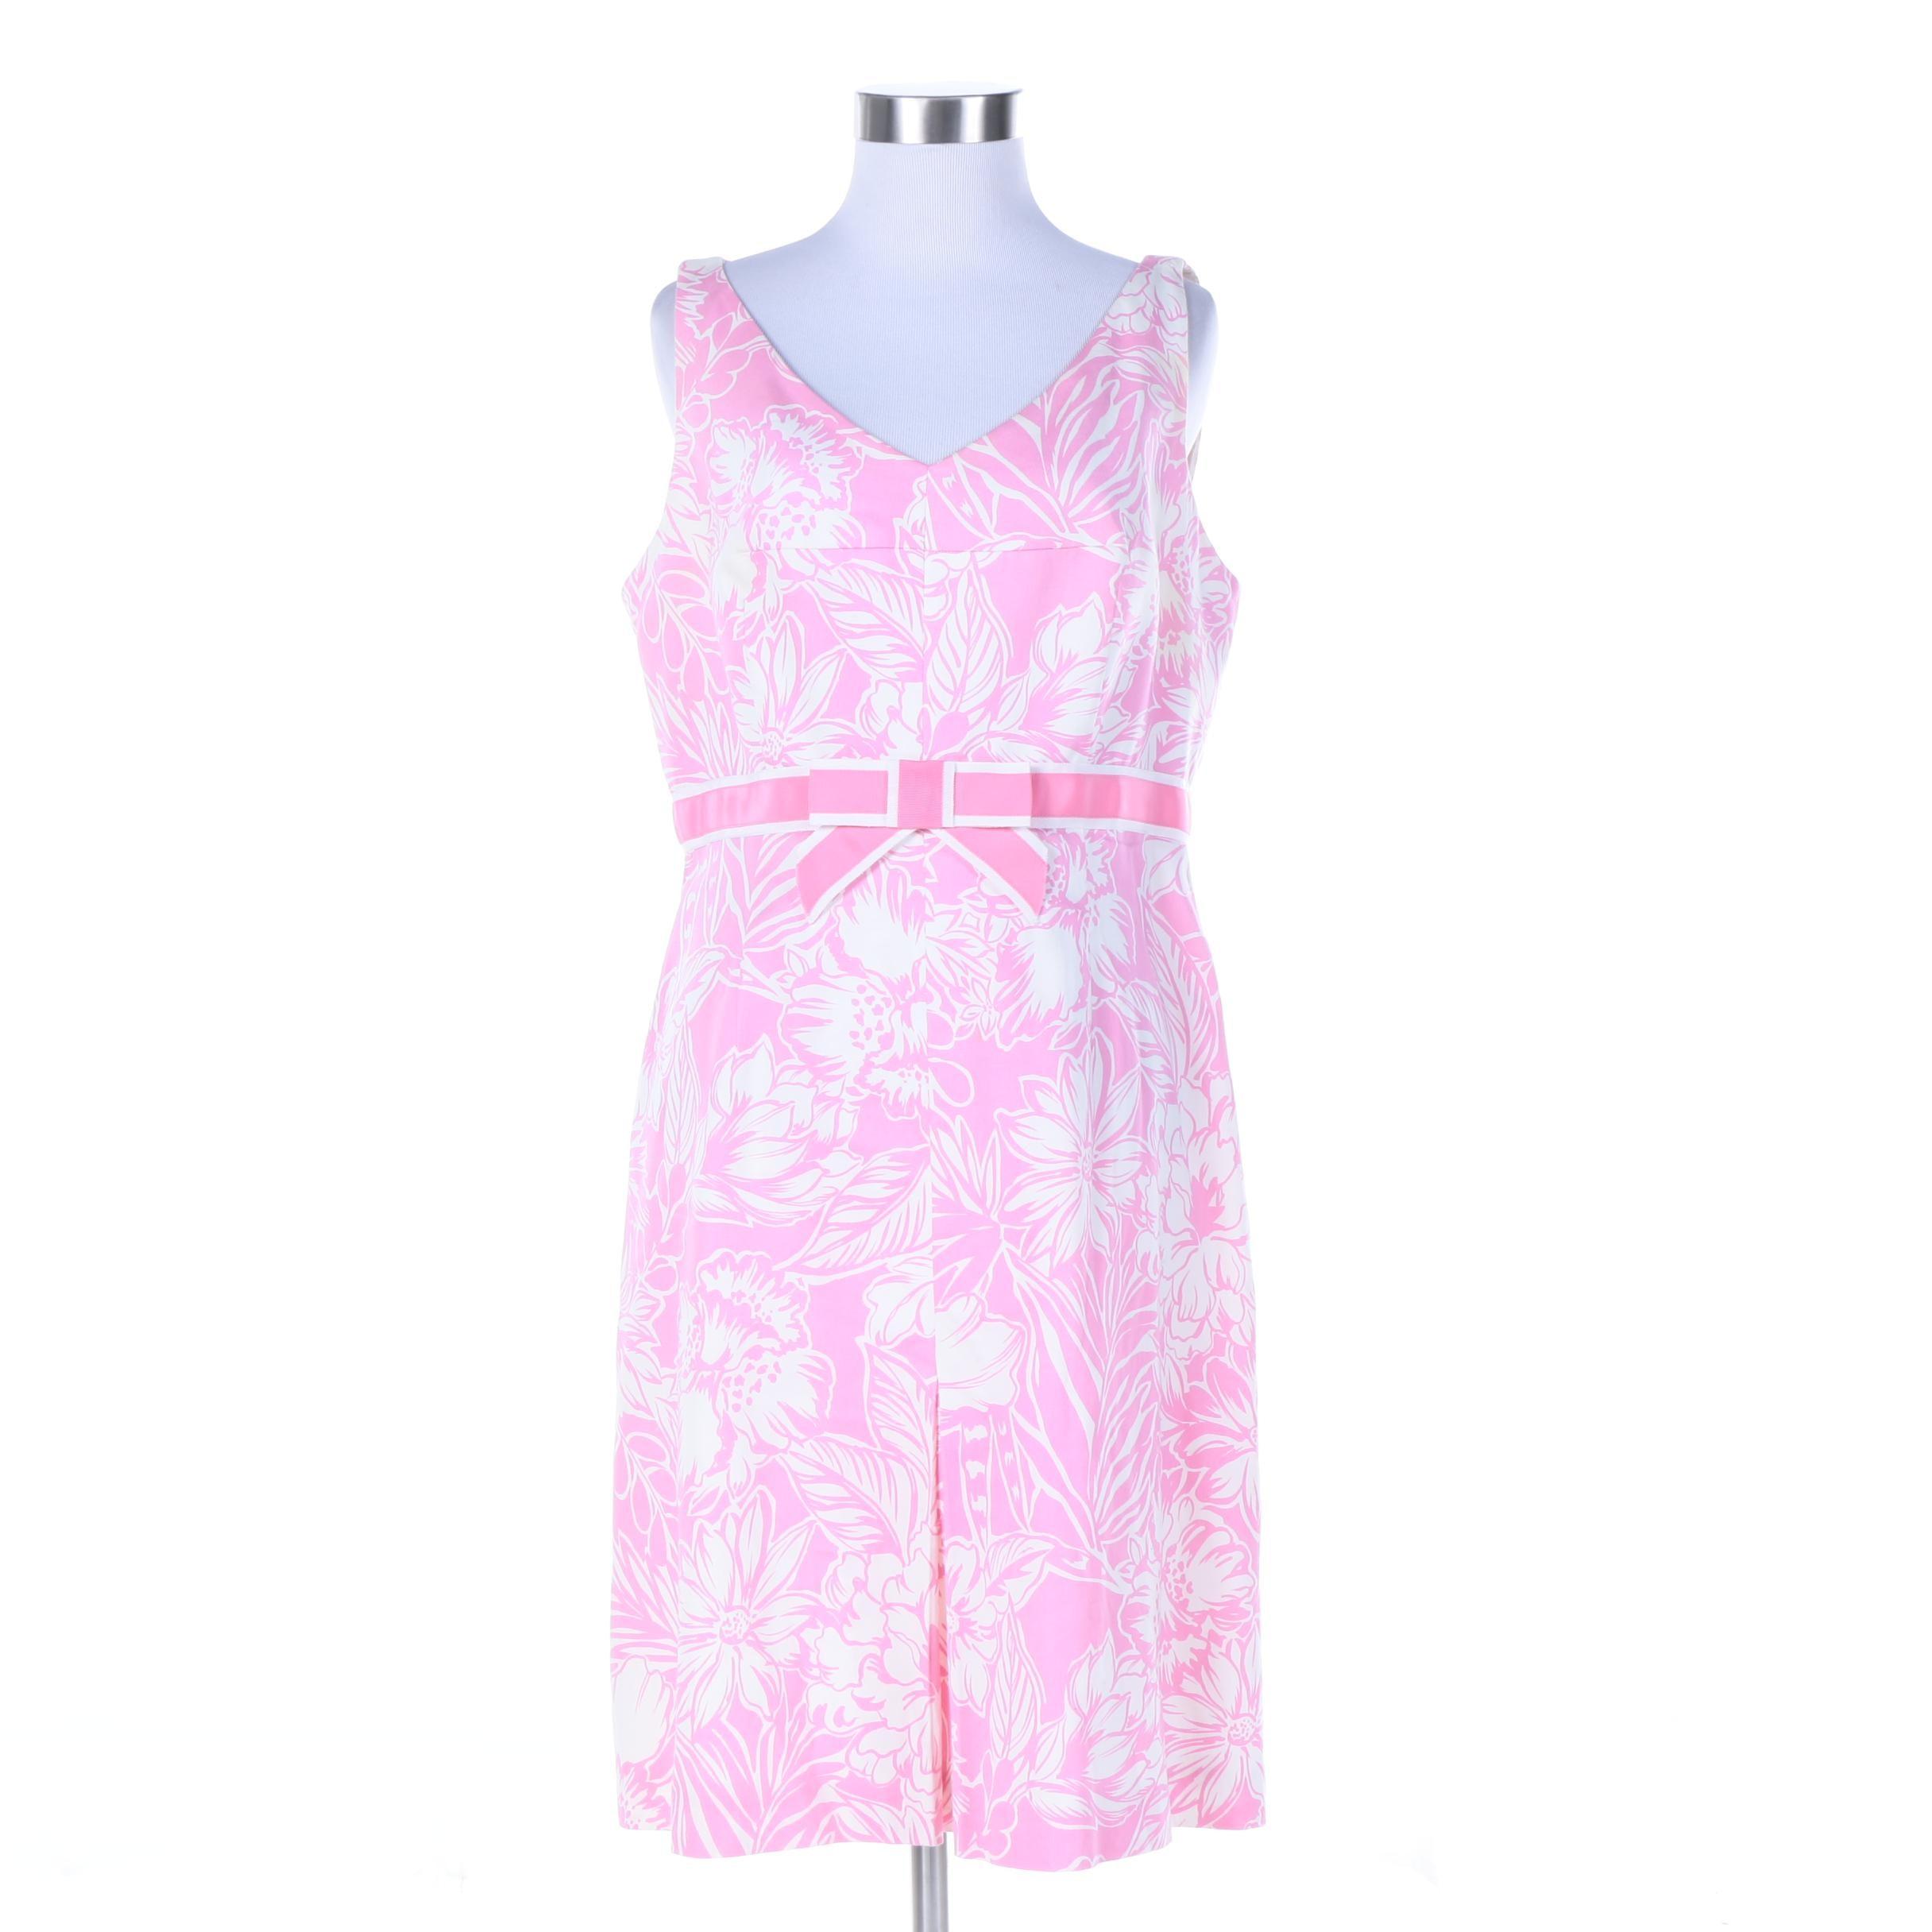 Rickie Freeman Teri Jon Pink Cotton Floral Print Sleeveless Dress